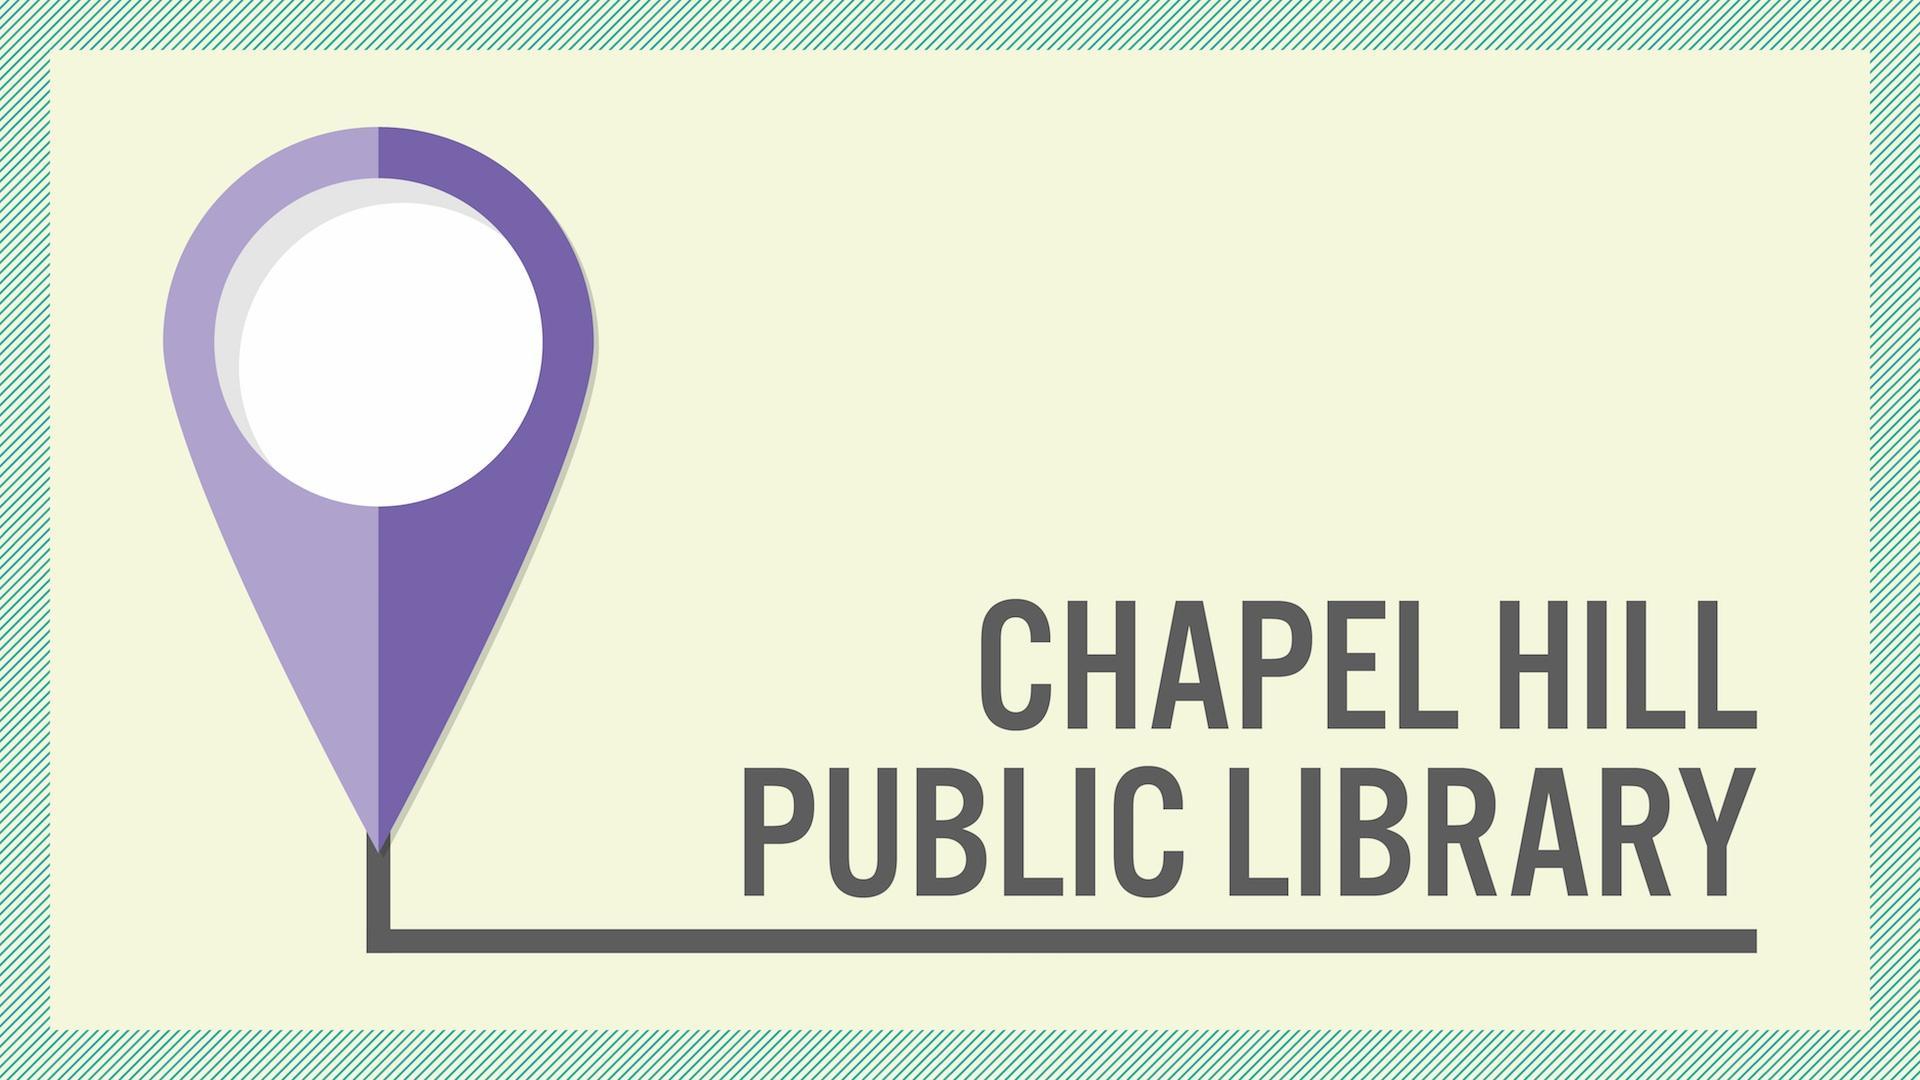 Chapel Hill Public Library